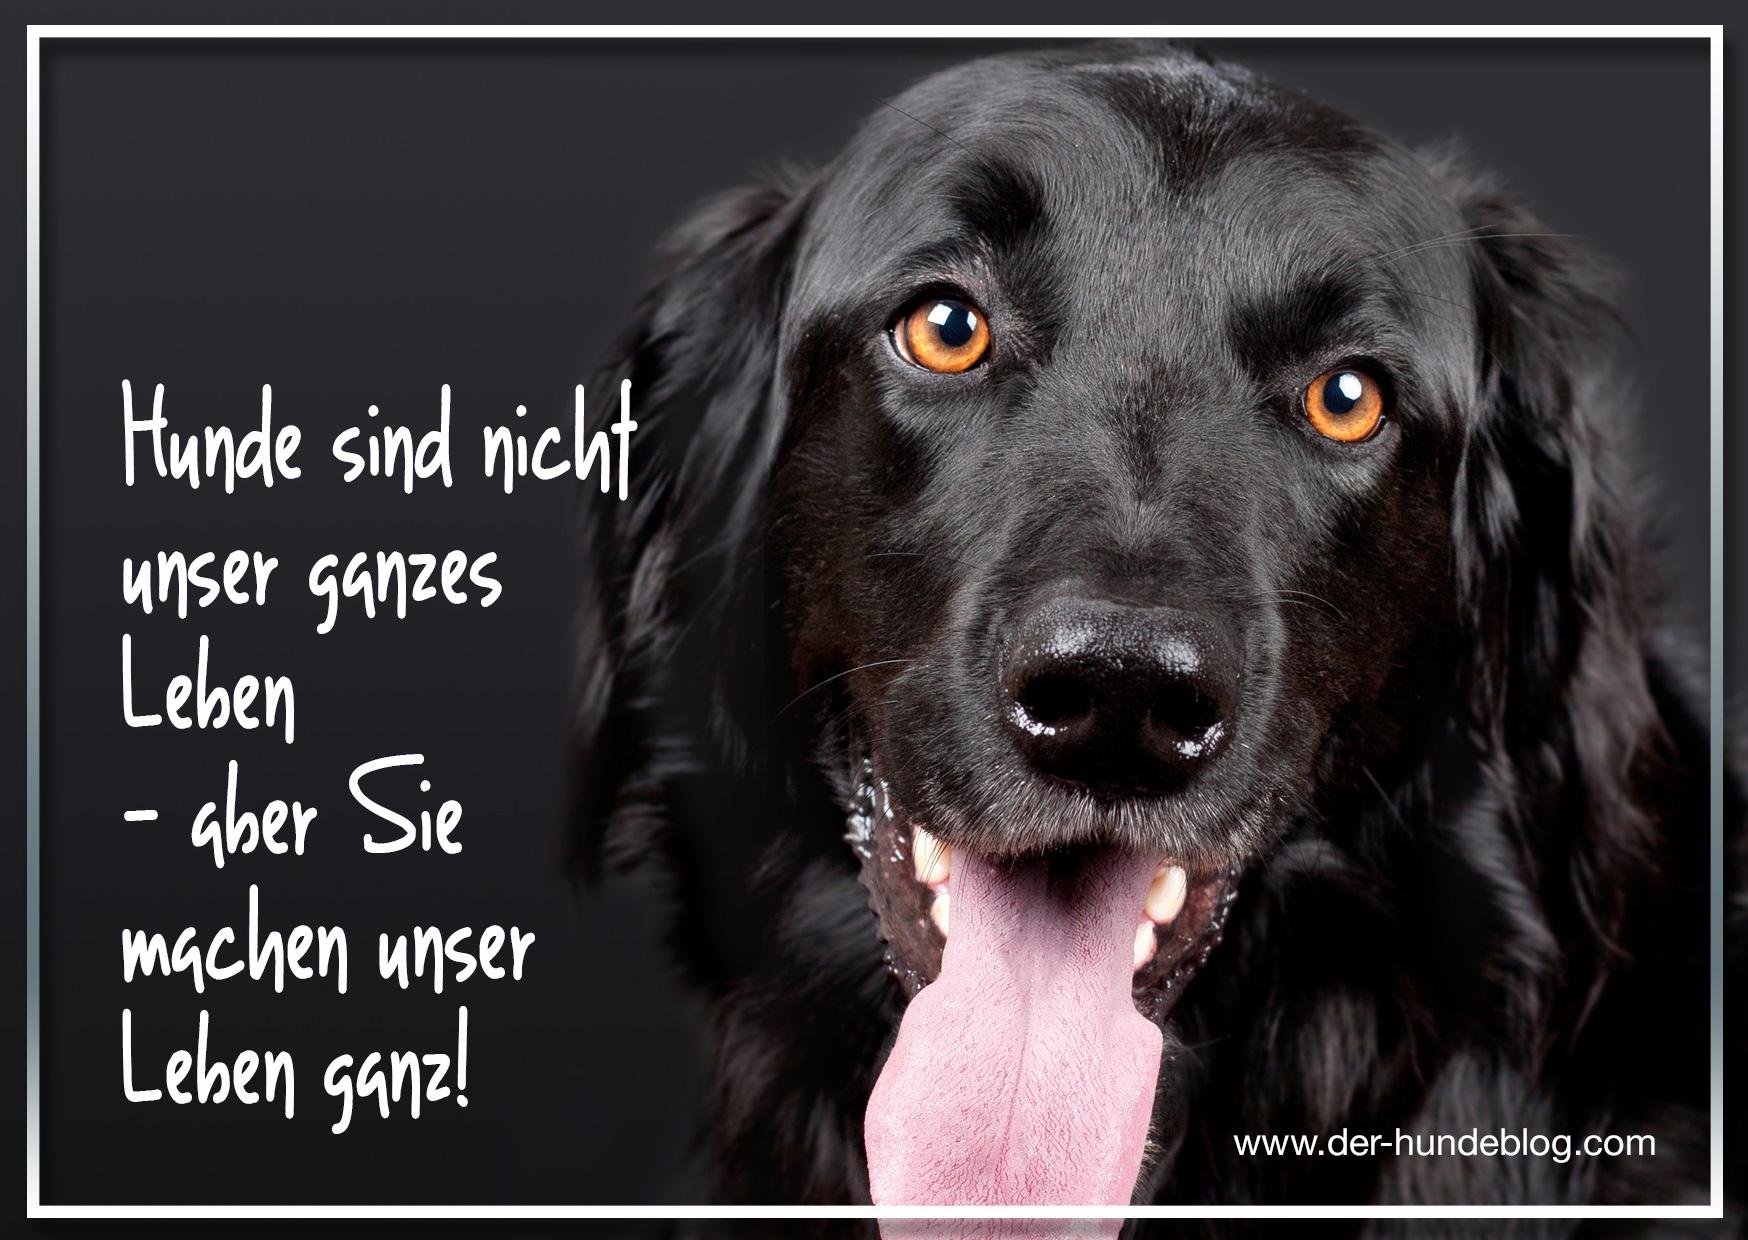 der-hundeblog-schoene-sprueche-hunde-11